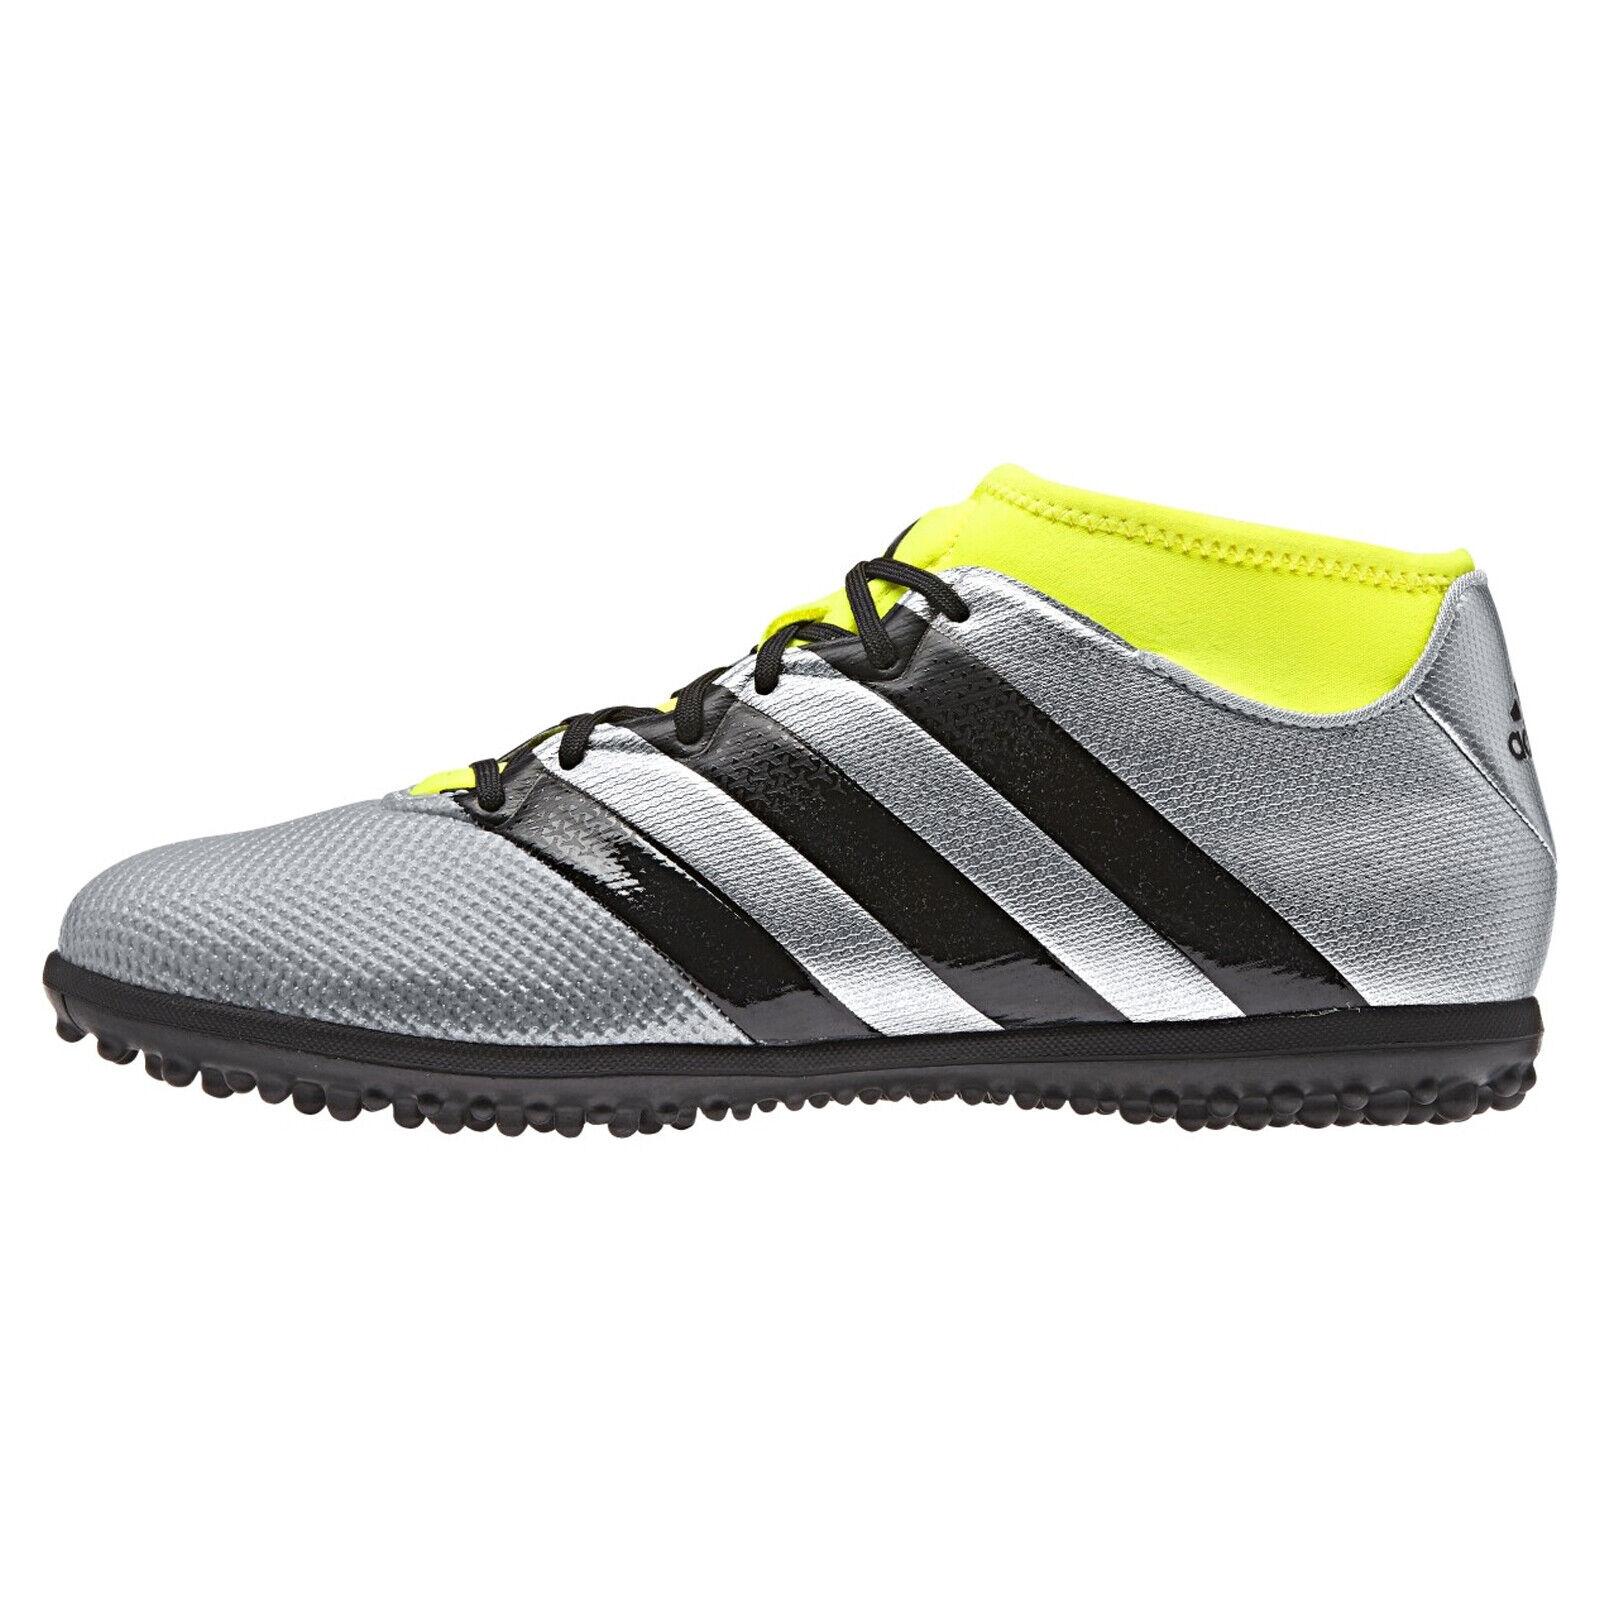 Original New Arrival Adidas ACE 17.3 PRIMEMESH AG Men's Soccer Shoes Sneakers